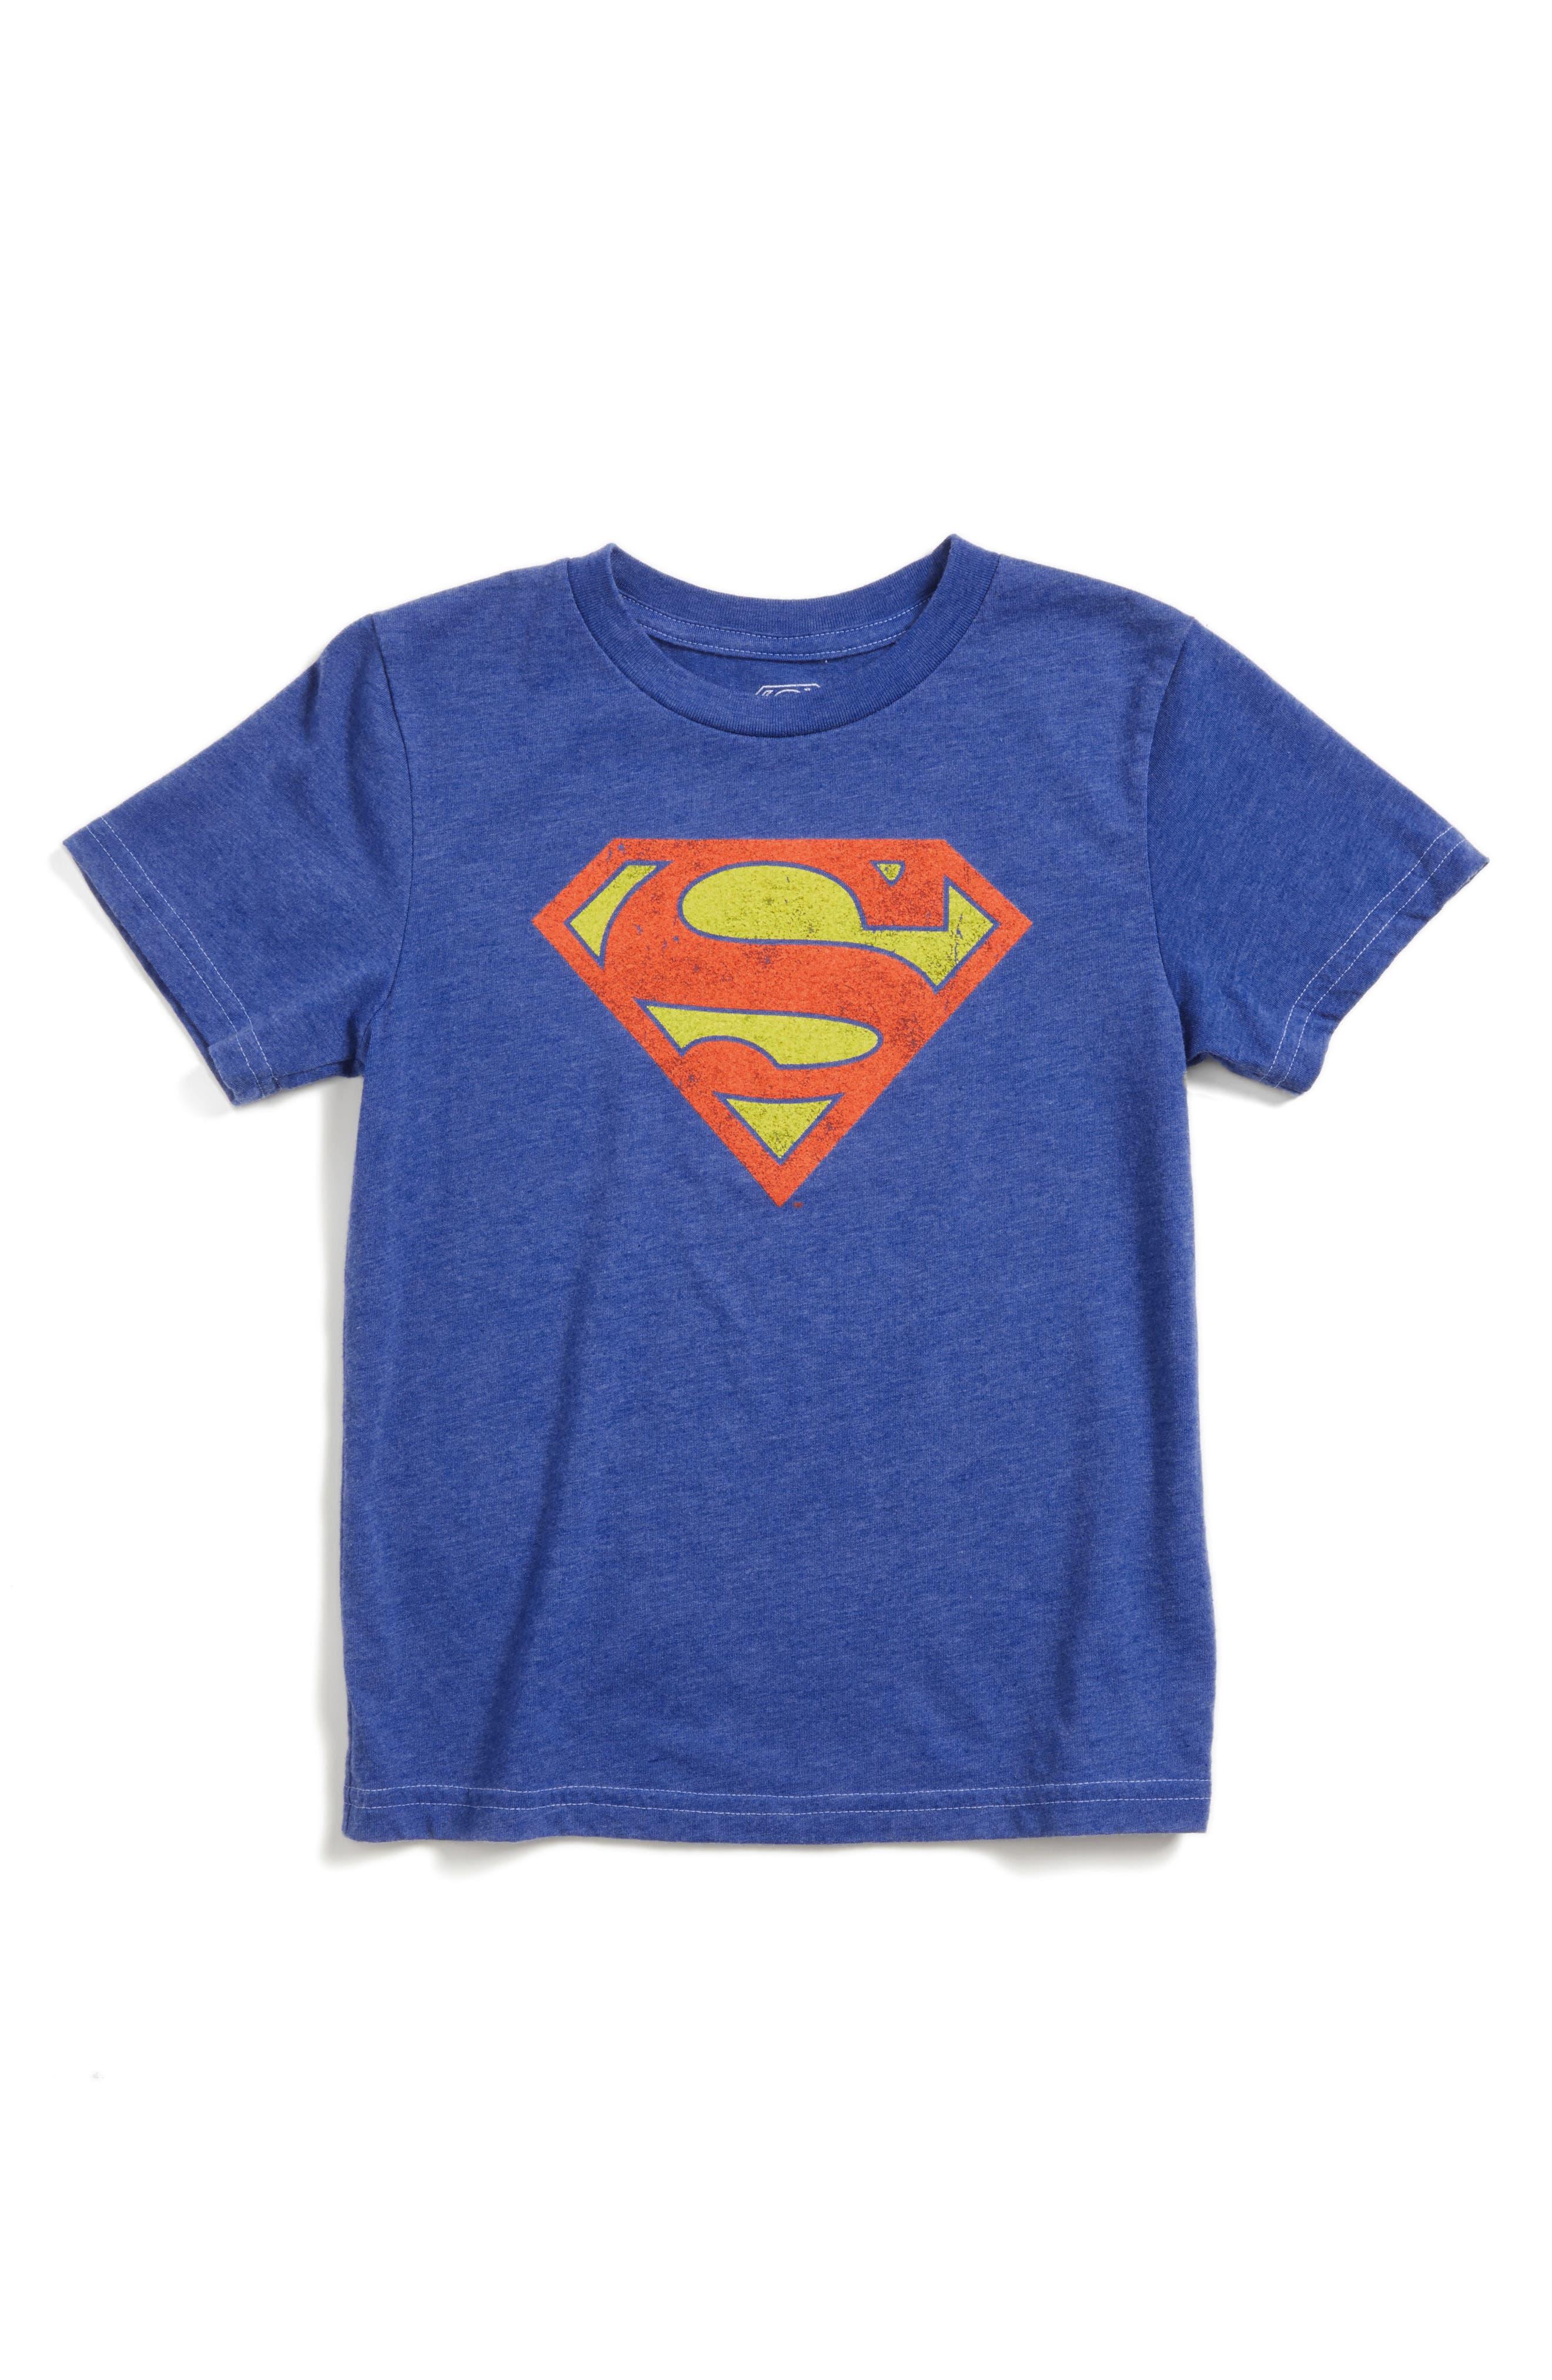 JEM Superman Graphic T-Shirt